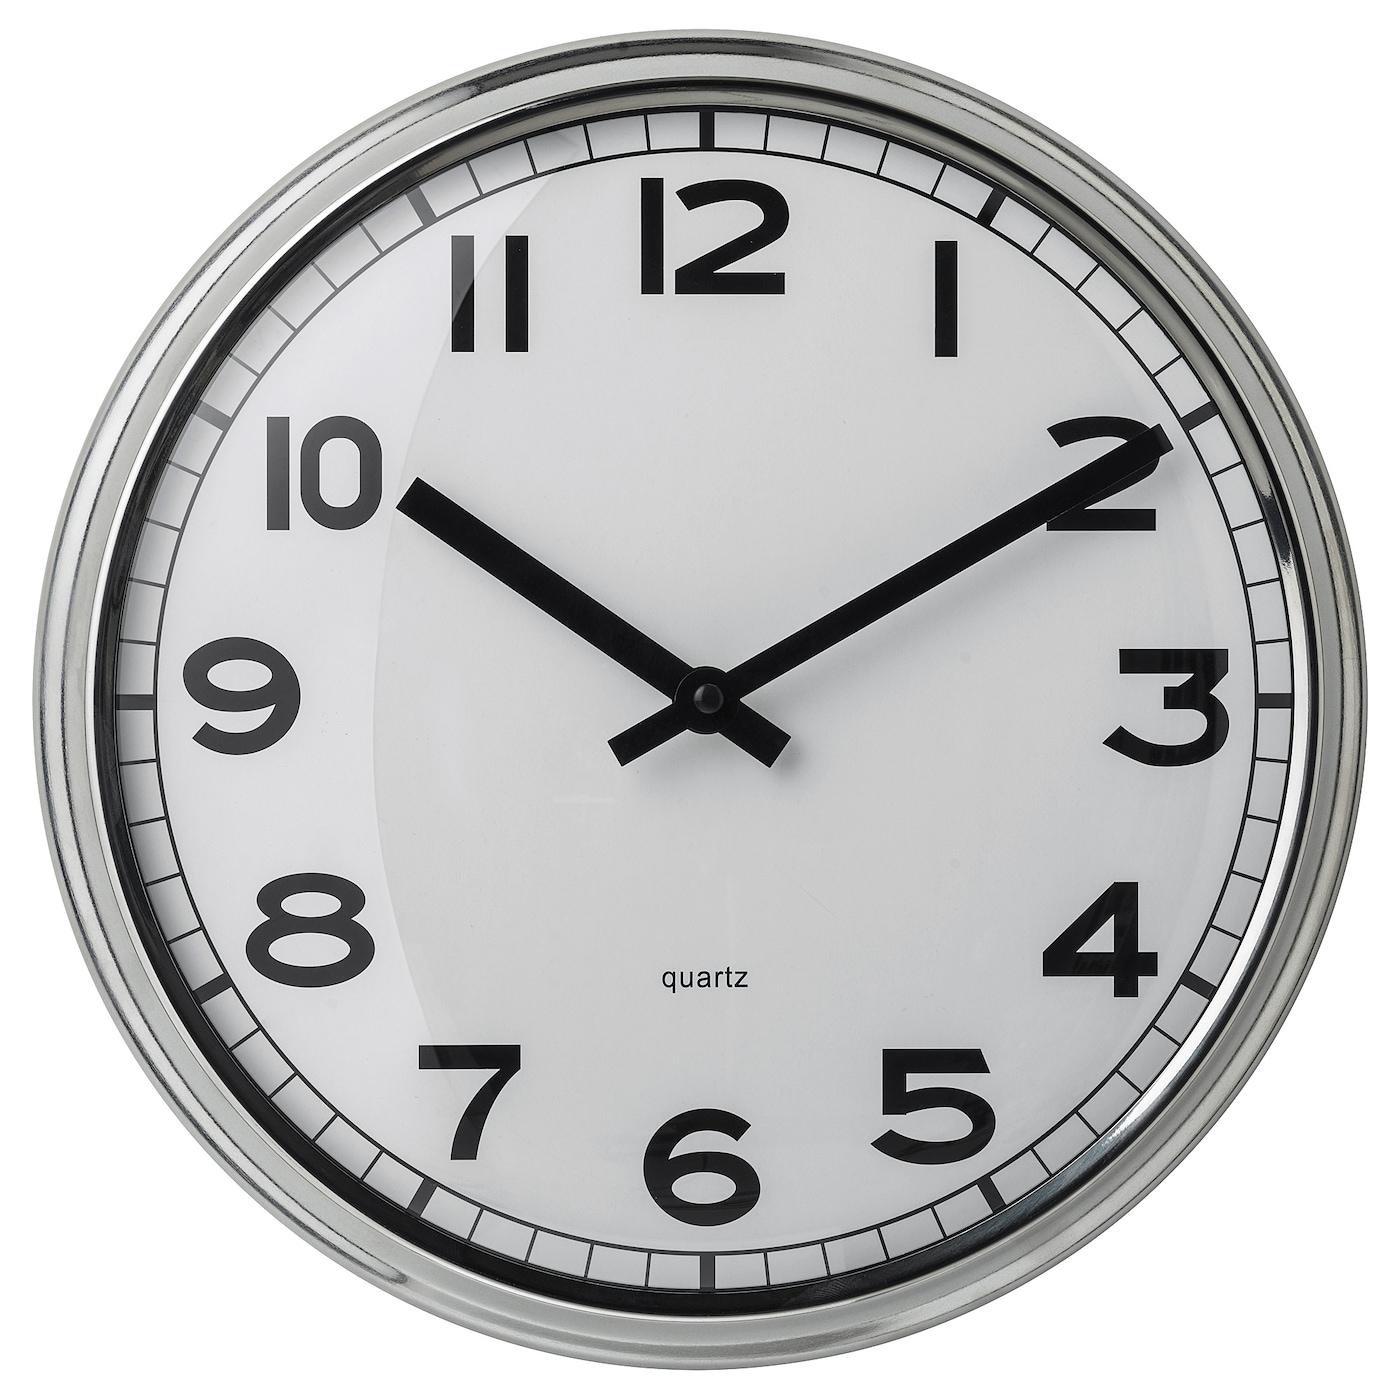 Pugg Horloge Murale Acier Inoxydable Ikea